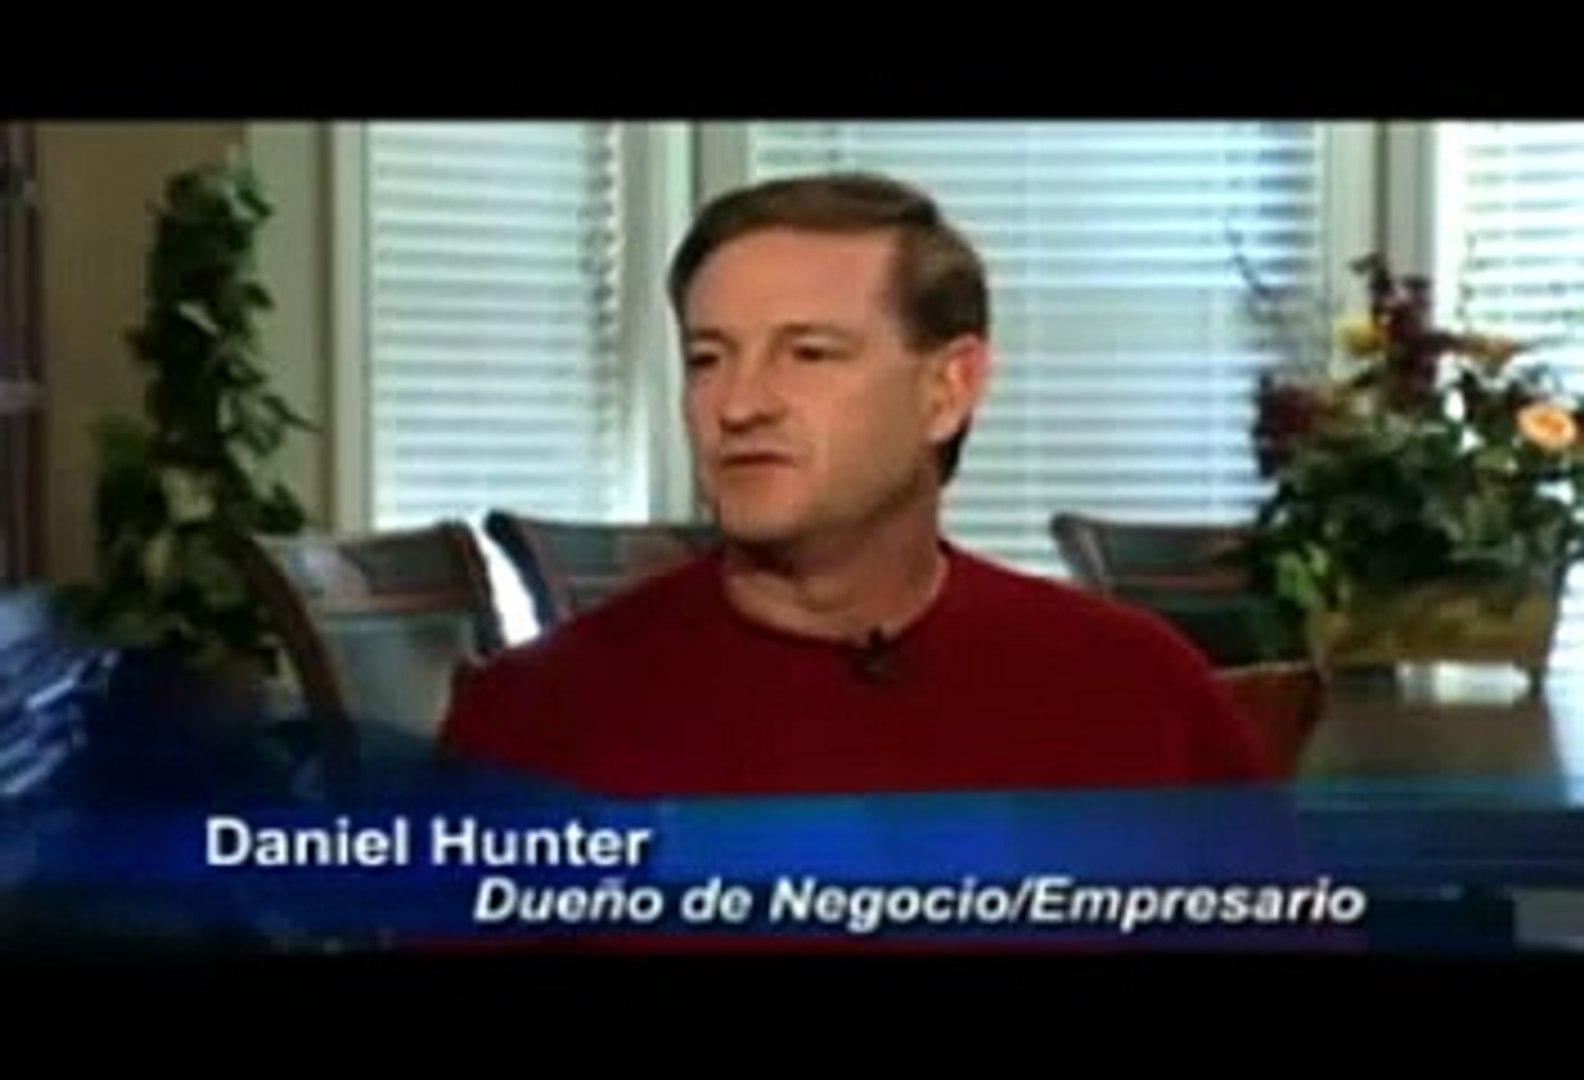 USANA Stephen Daniel con Daniel Hunter